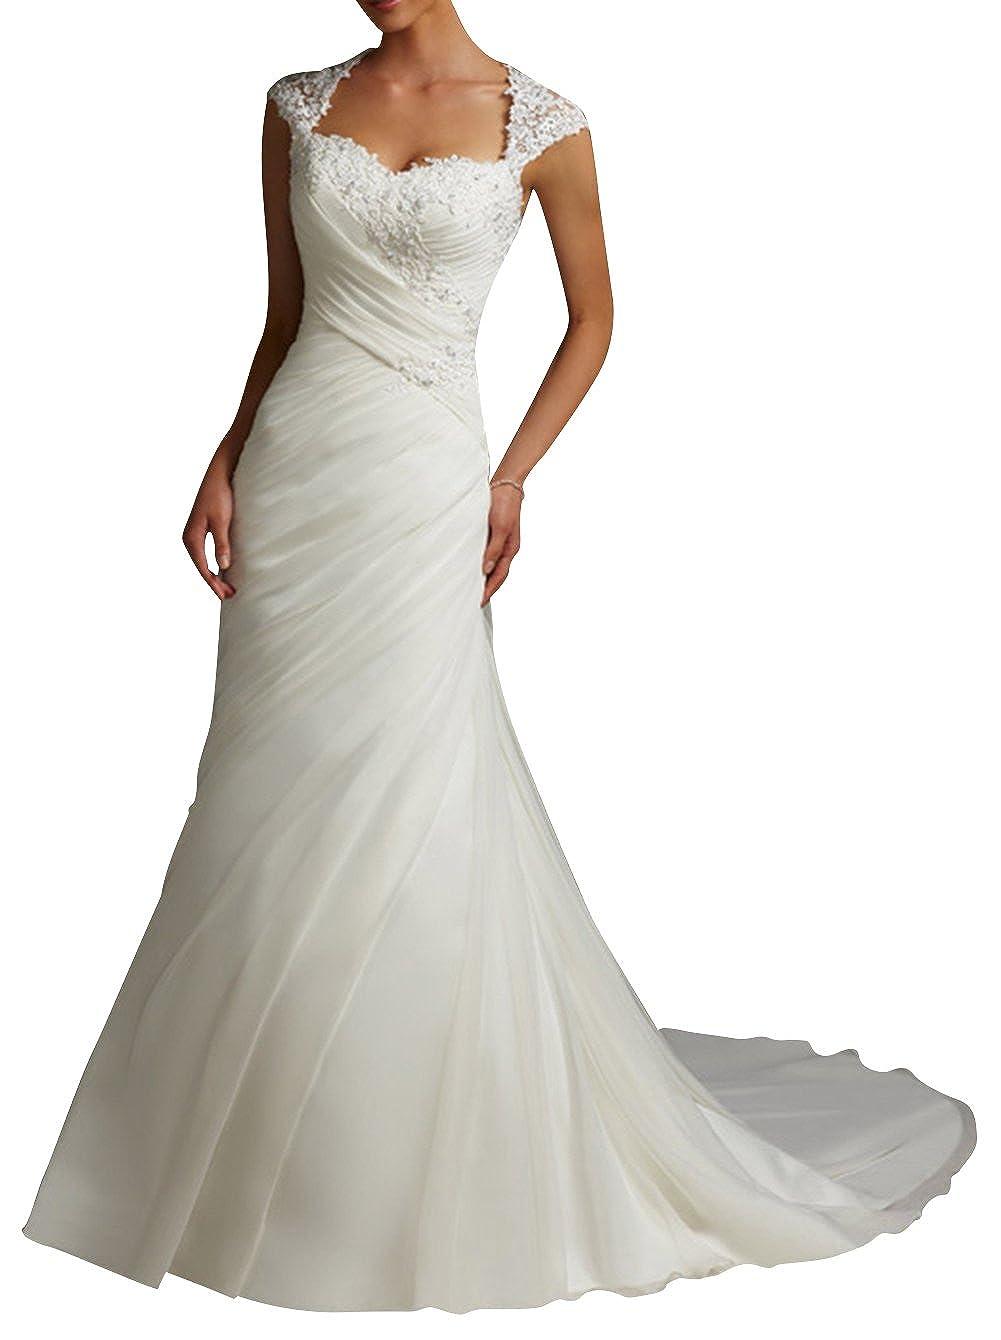 Dapene Womens Lace Sweetheart Mermaid Train Bridal Gown Wedding